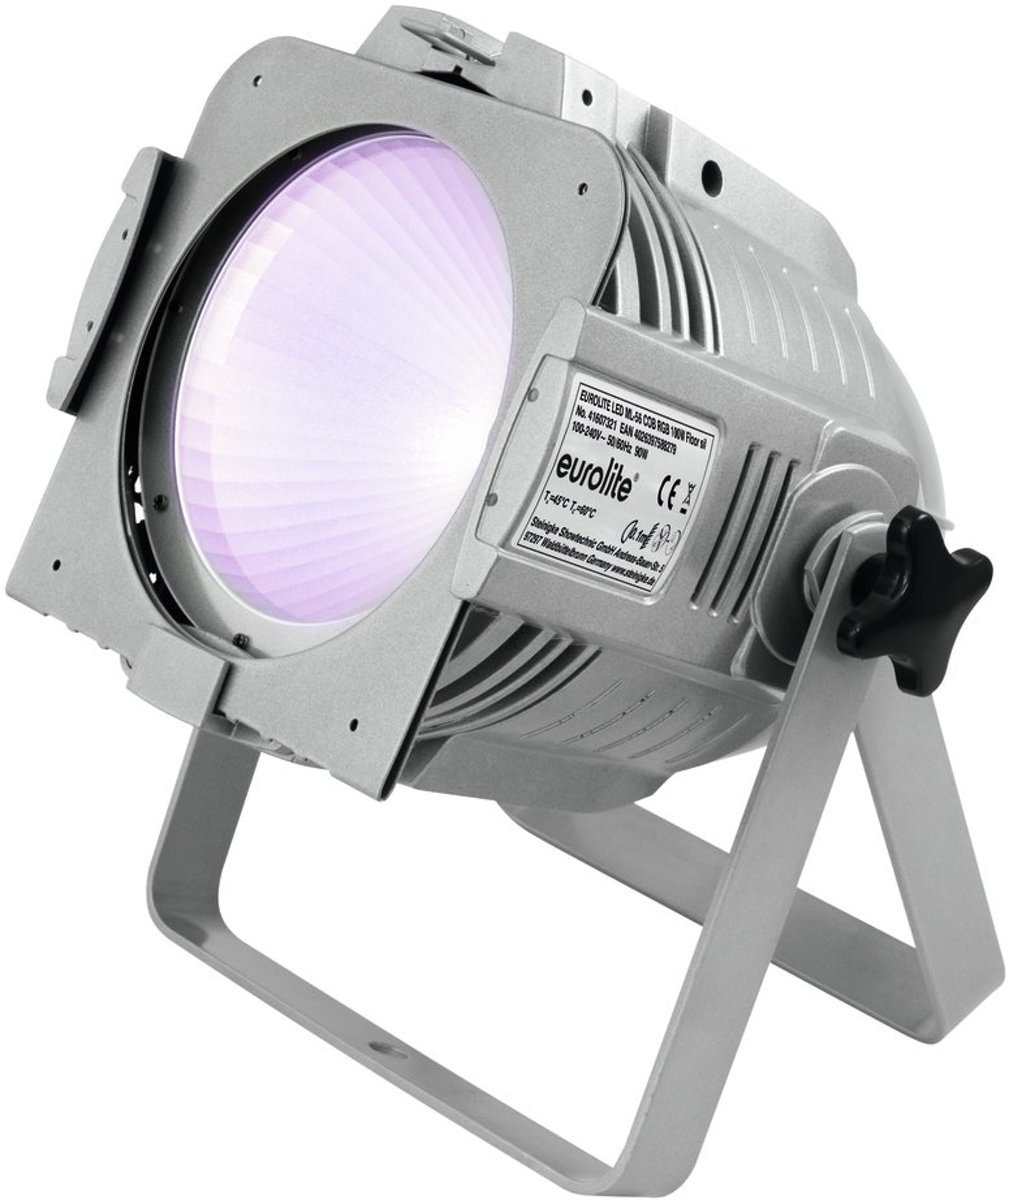 EUROLITE LED ML-56 COB RGB 100W vloer zwart - LED Par kopen